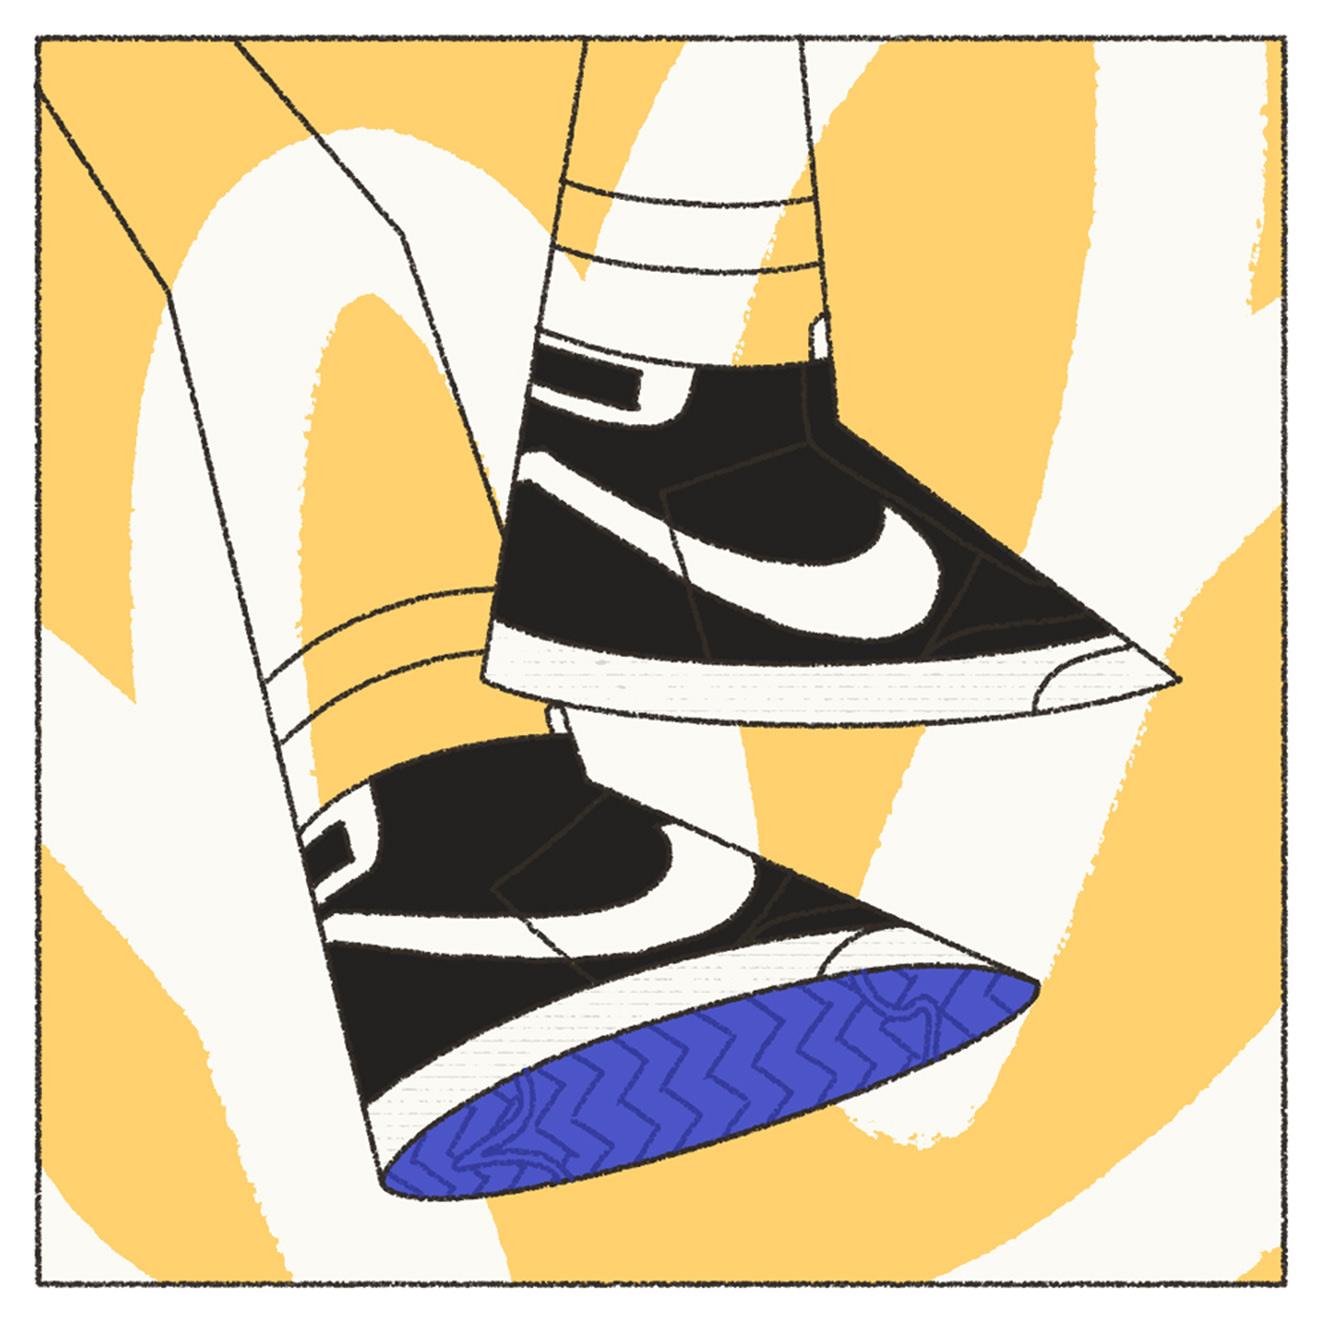 Black, white and yellow illustration of Nike Blazer SB sneakers